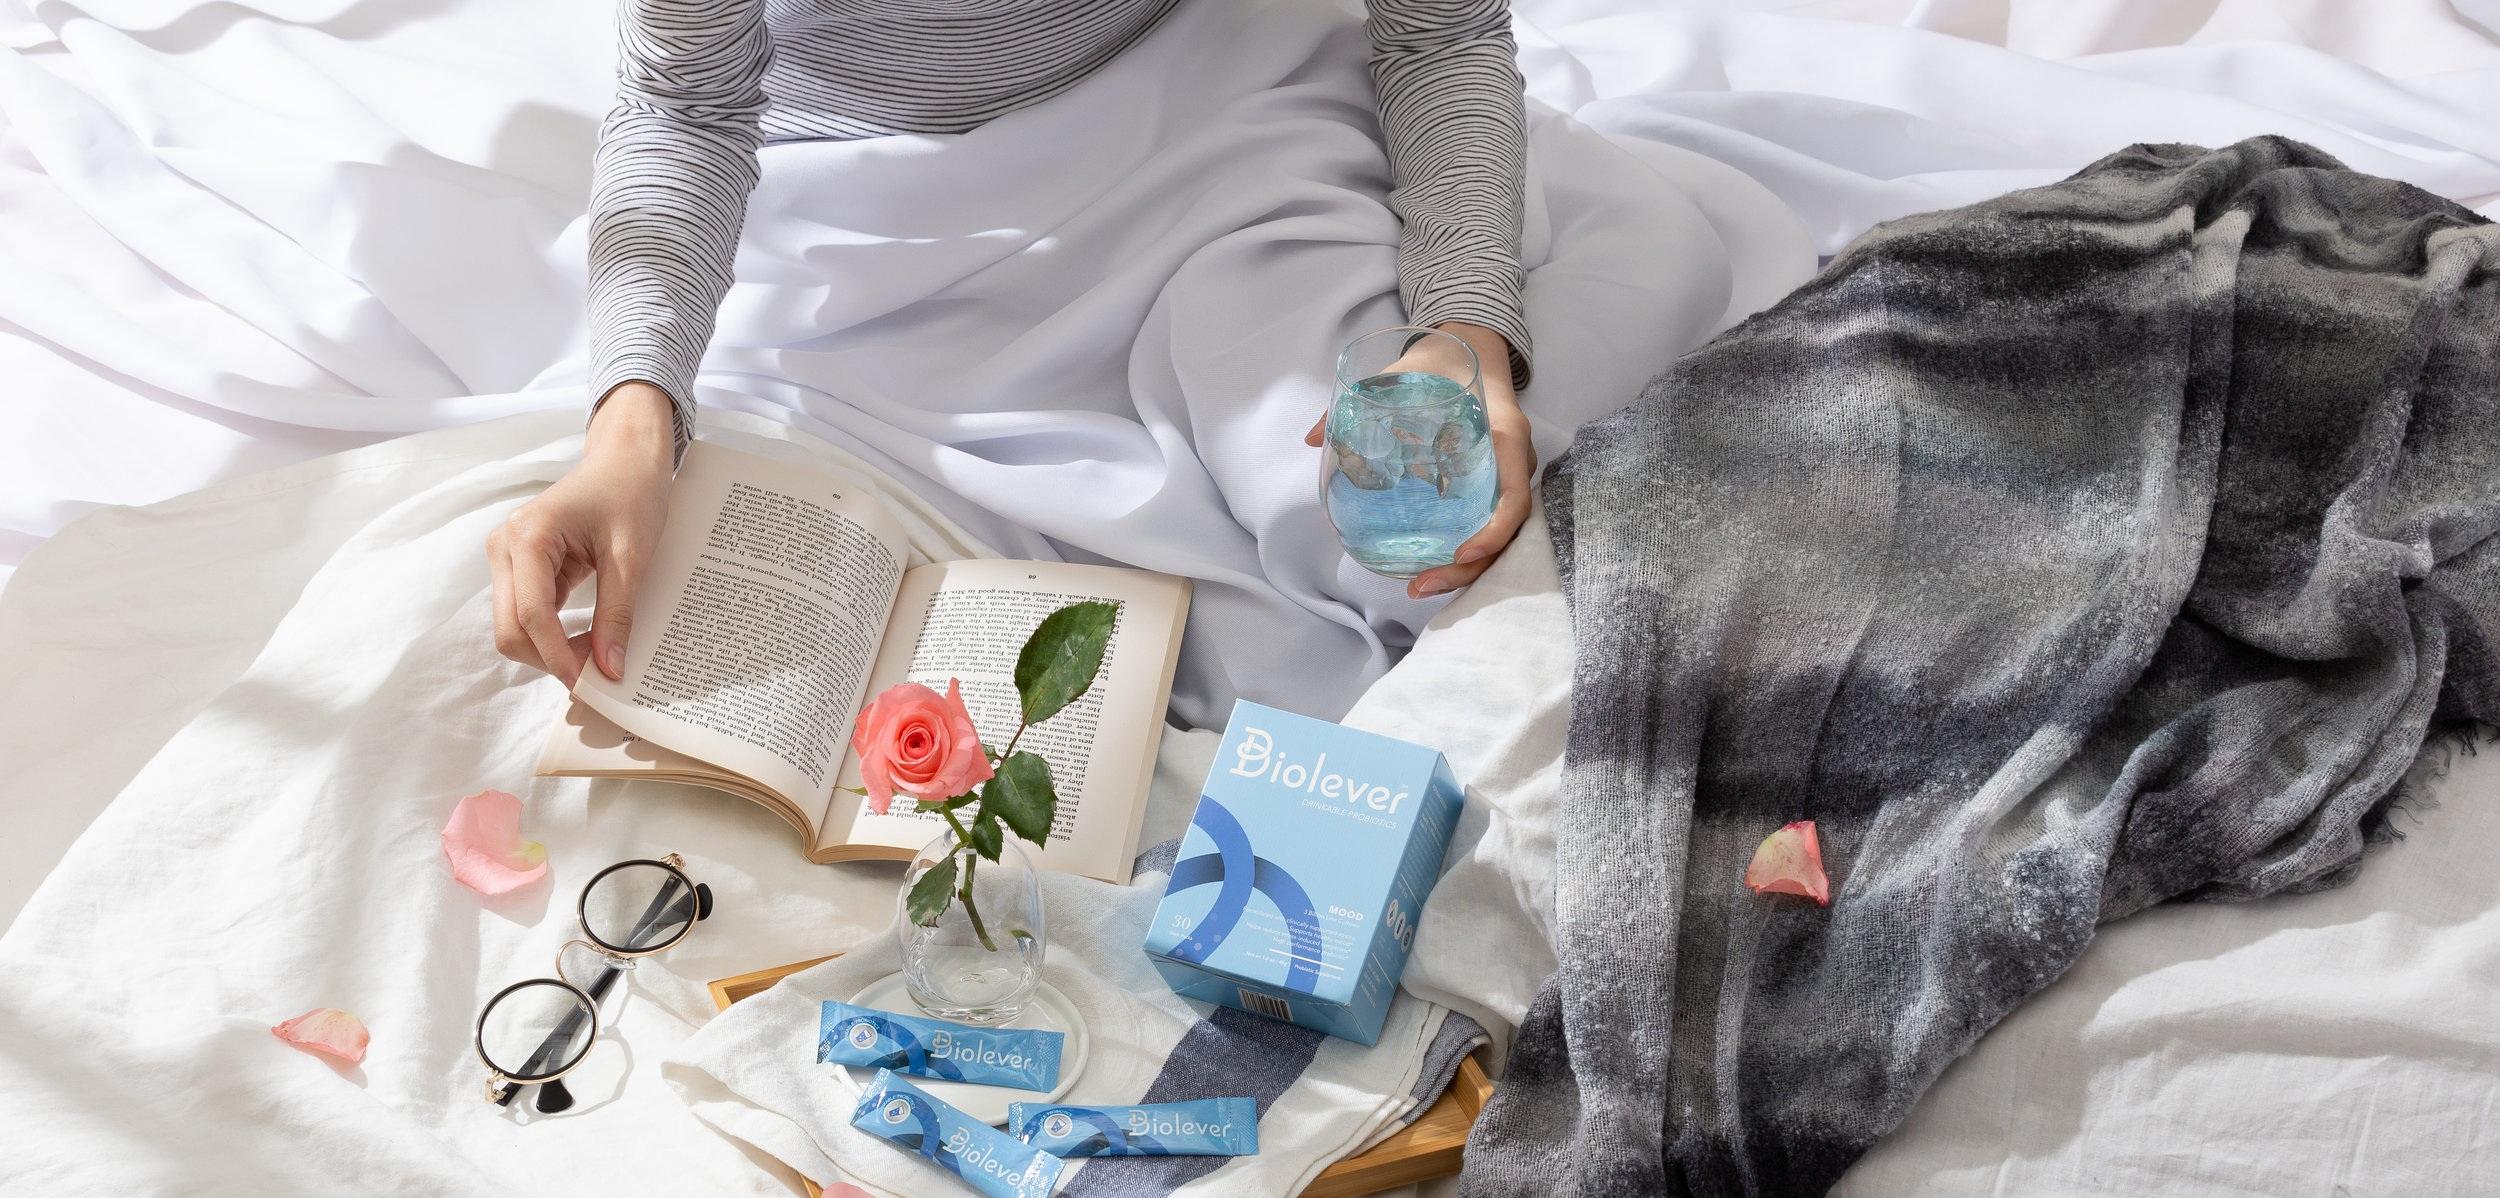 biolever+mood+probiotics+-+woman+read+book+sleep+emotion